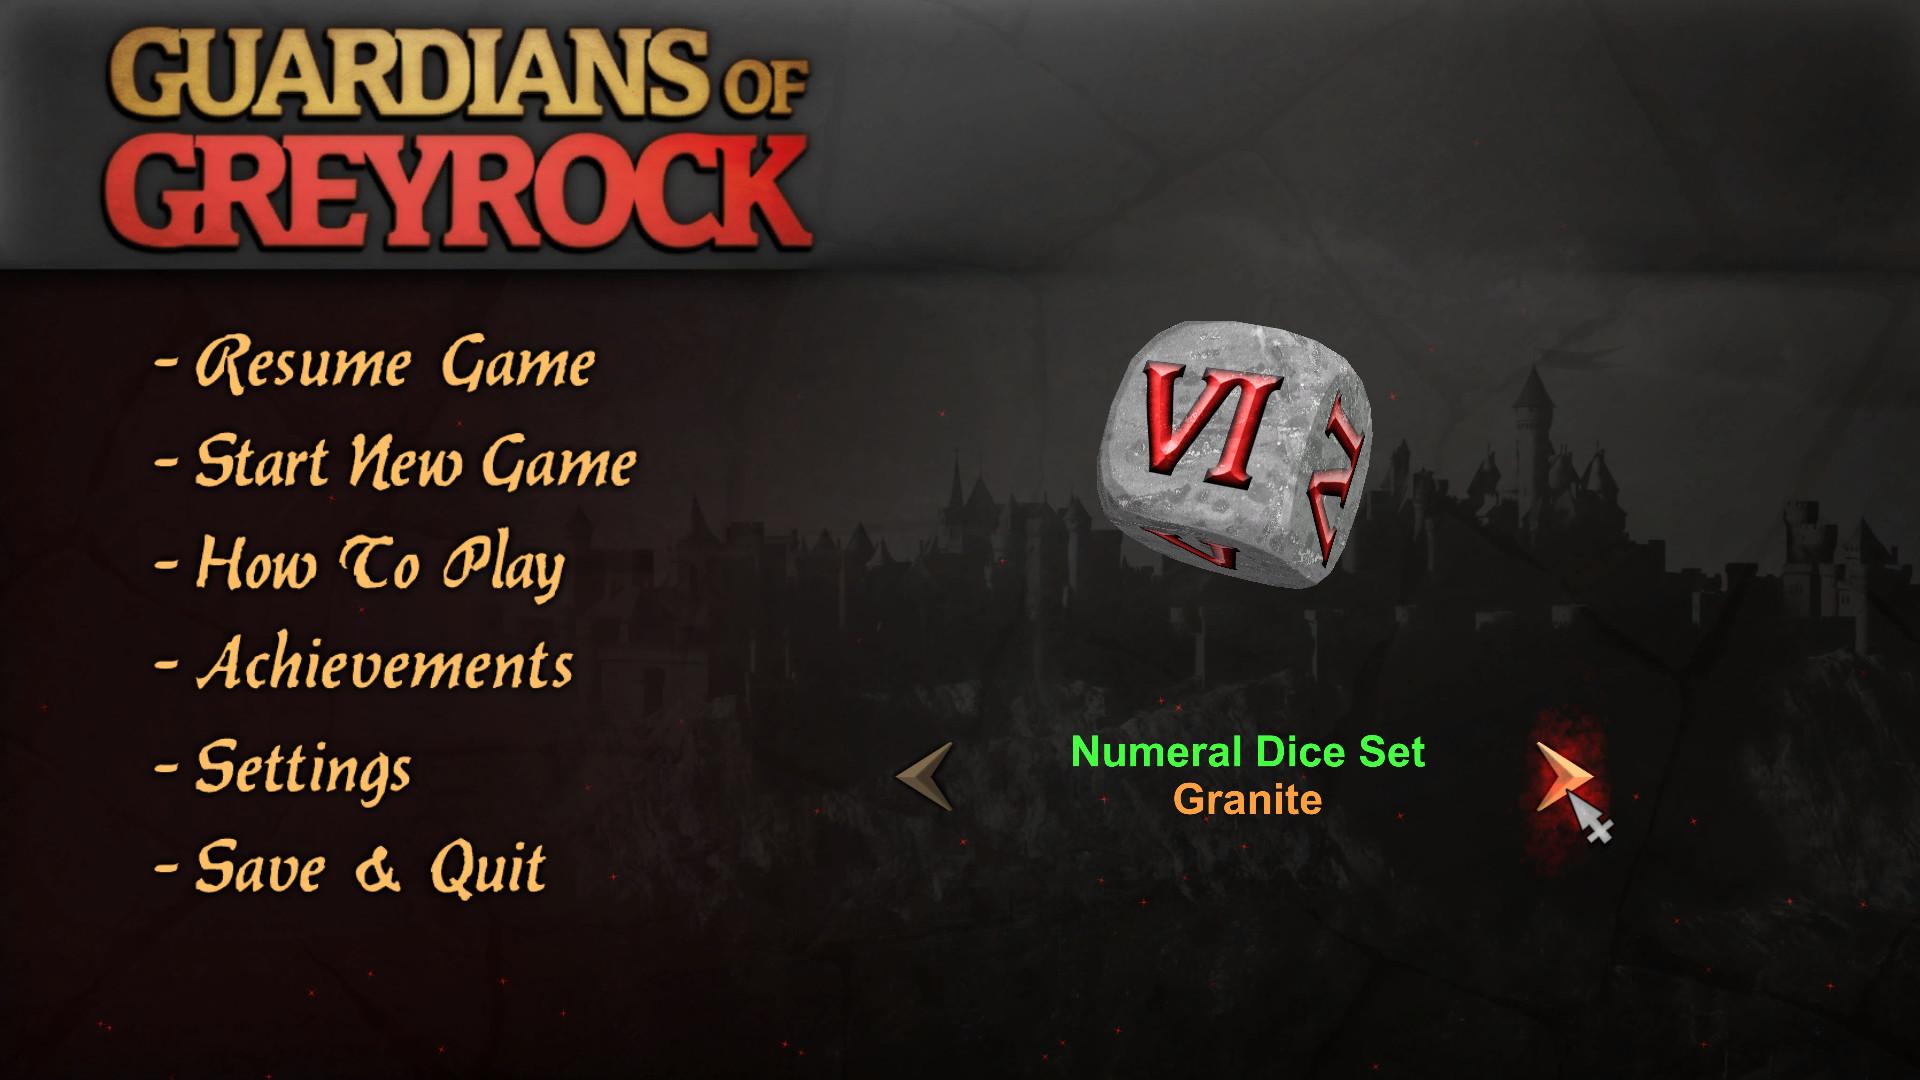 Guardians of Greyrock - Dice Pack: Numeral Set screenshot